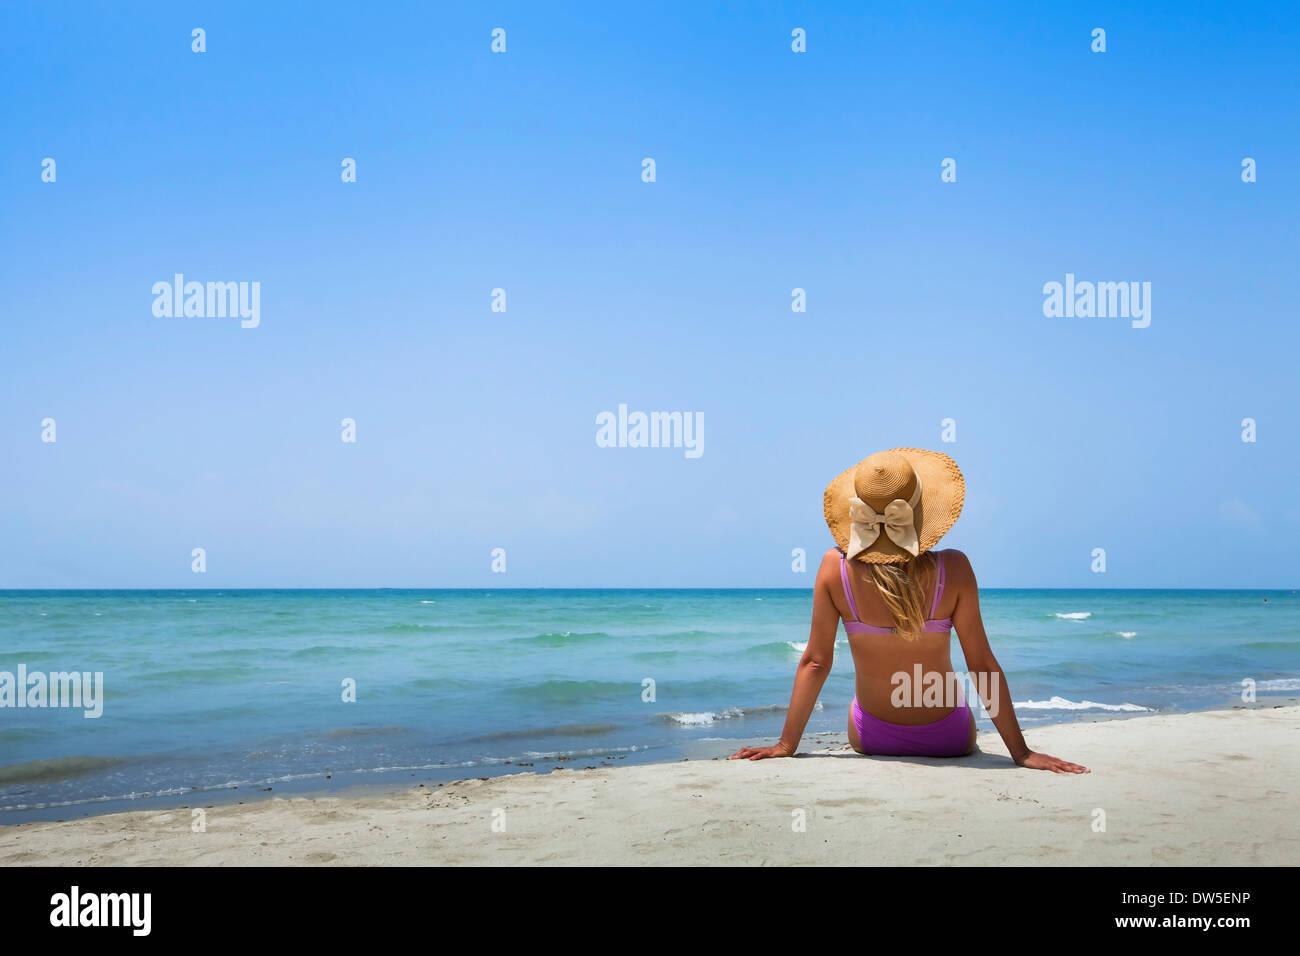 Woman in bikini sur la plage Photo Stock